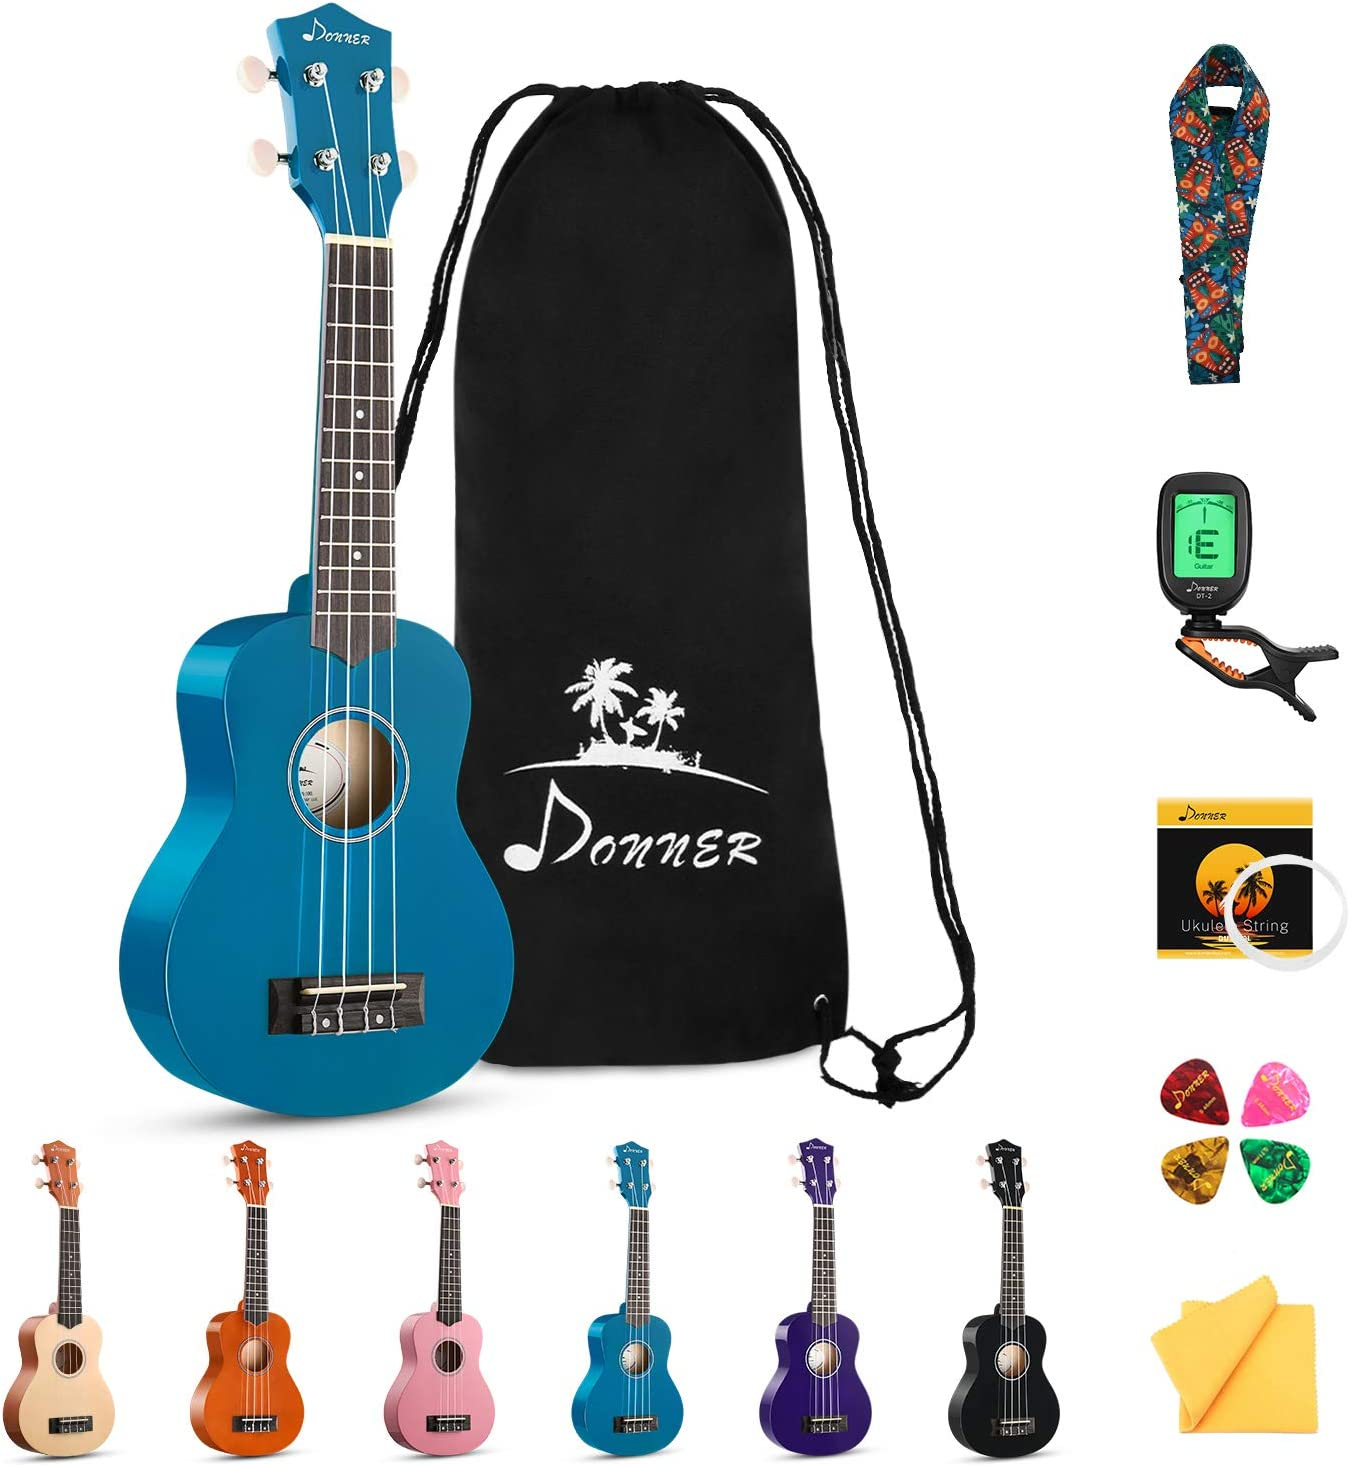 Donner Soprano Ukulele Beginner Kit Max 90% OFF for with Adult Student 5 ☆ popular Kid O